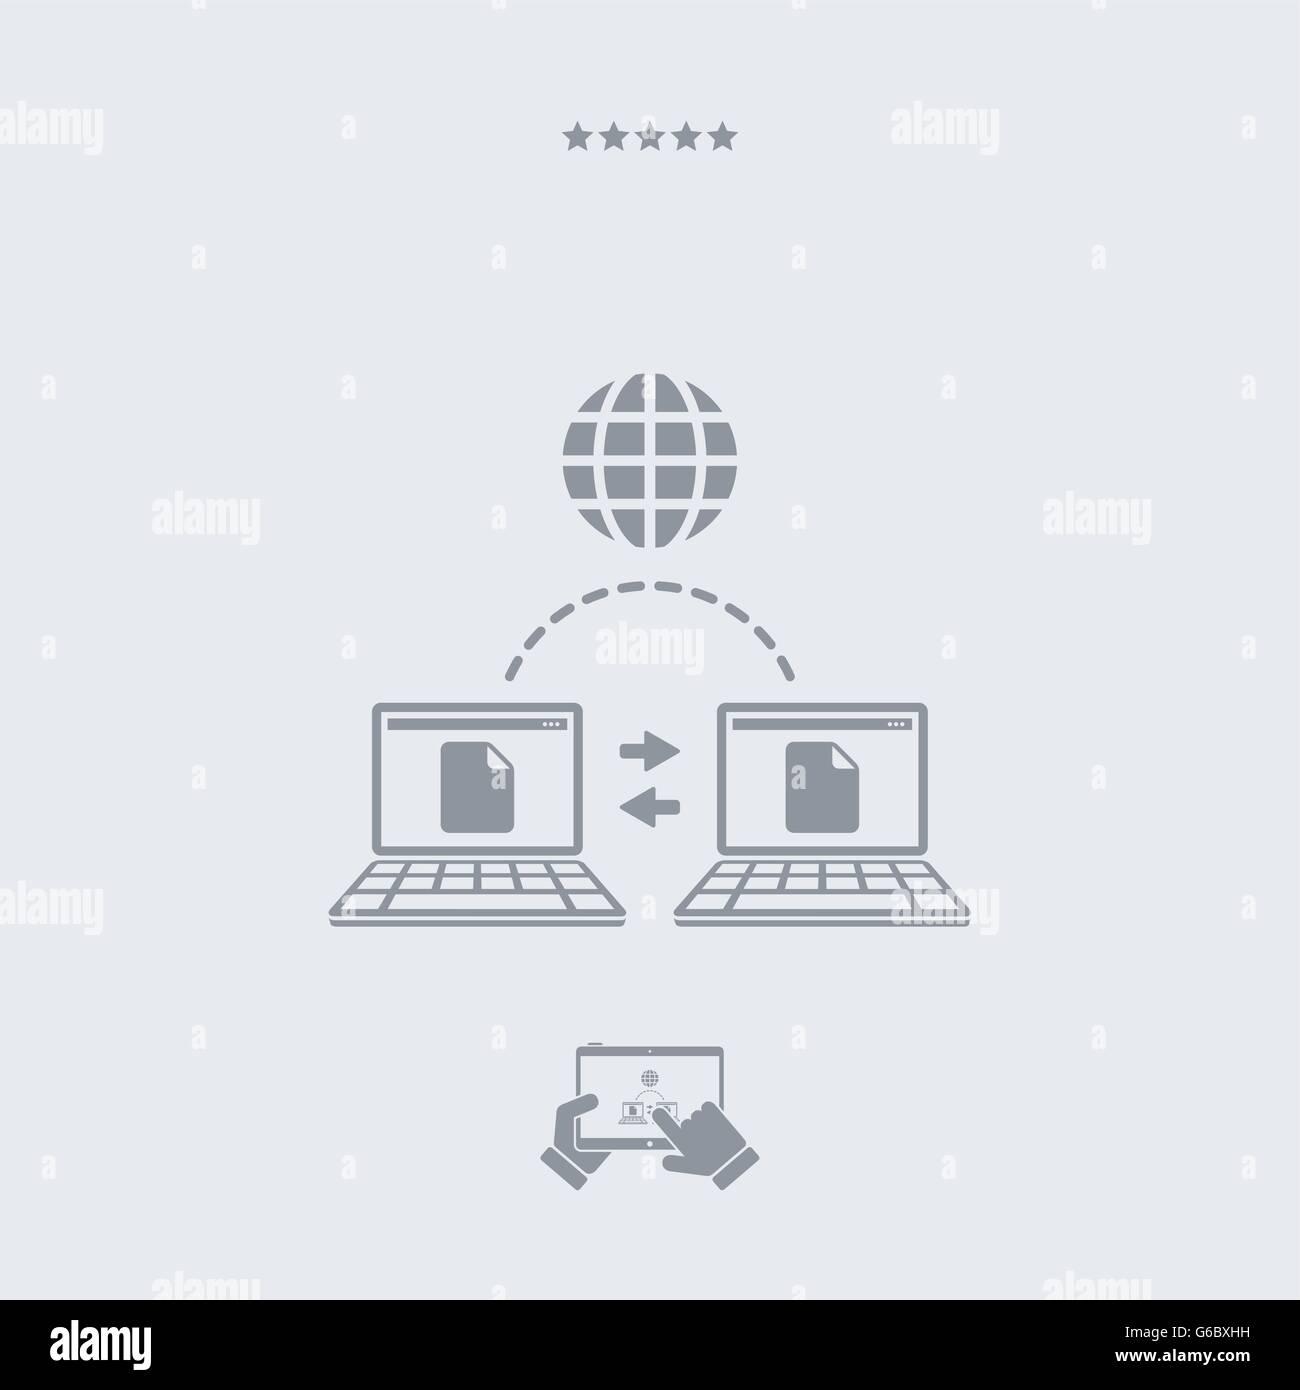 Bluetooth Symbol Stockfotos & Bluetooth Symbol Bilder - Alamy